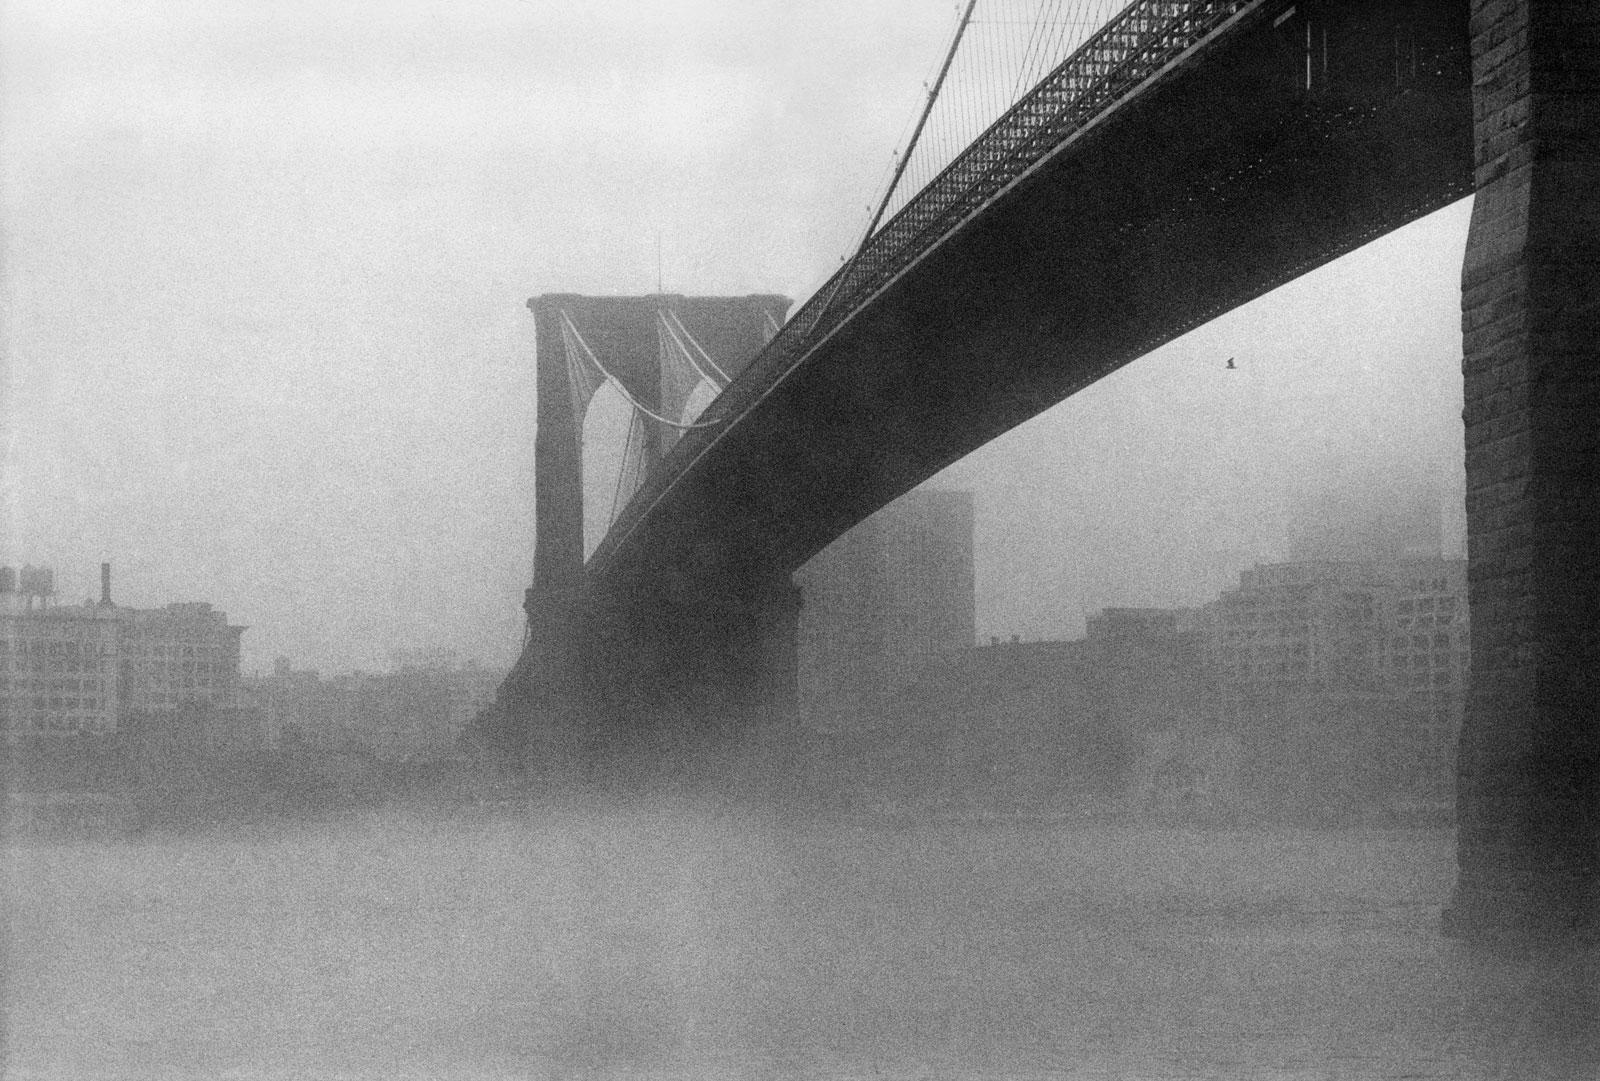 hart crane brooklyn bridge